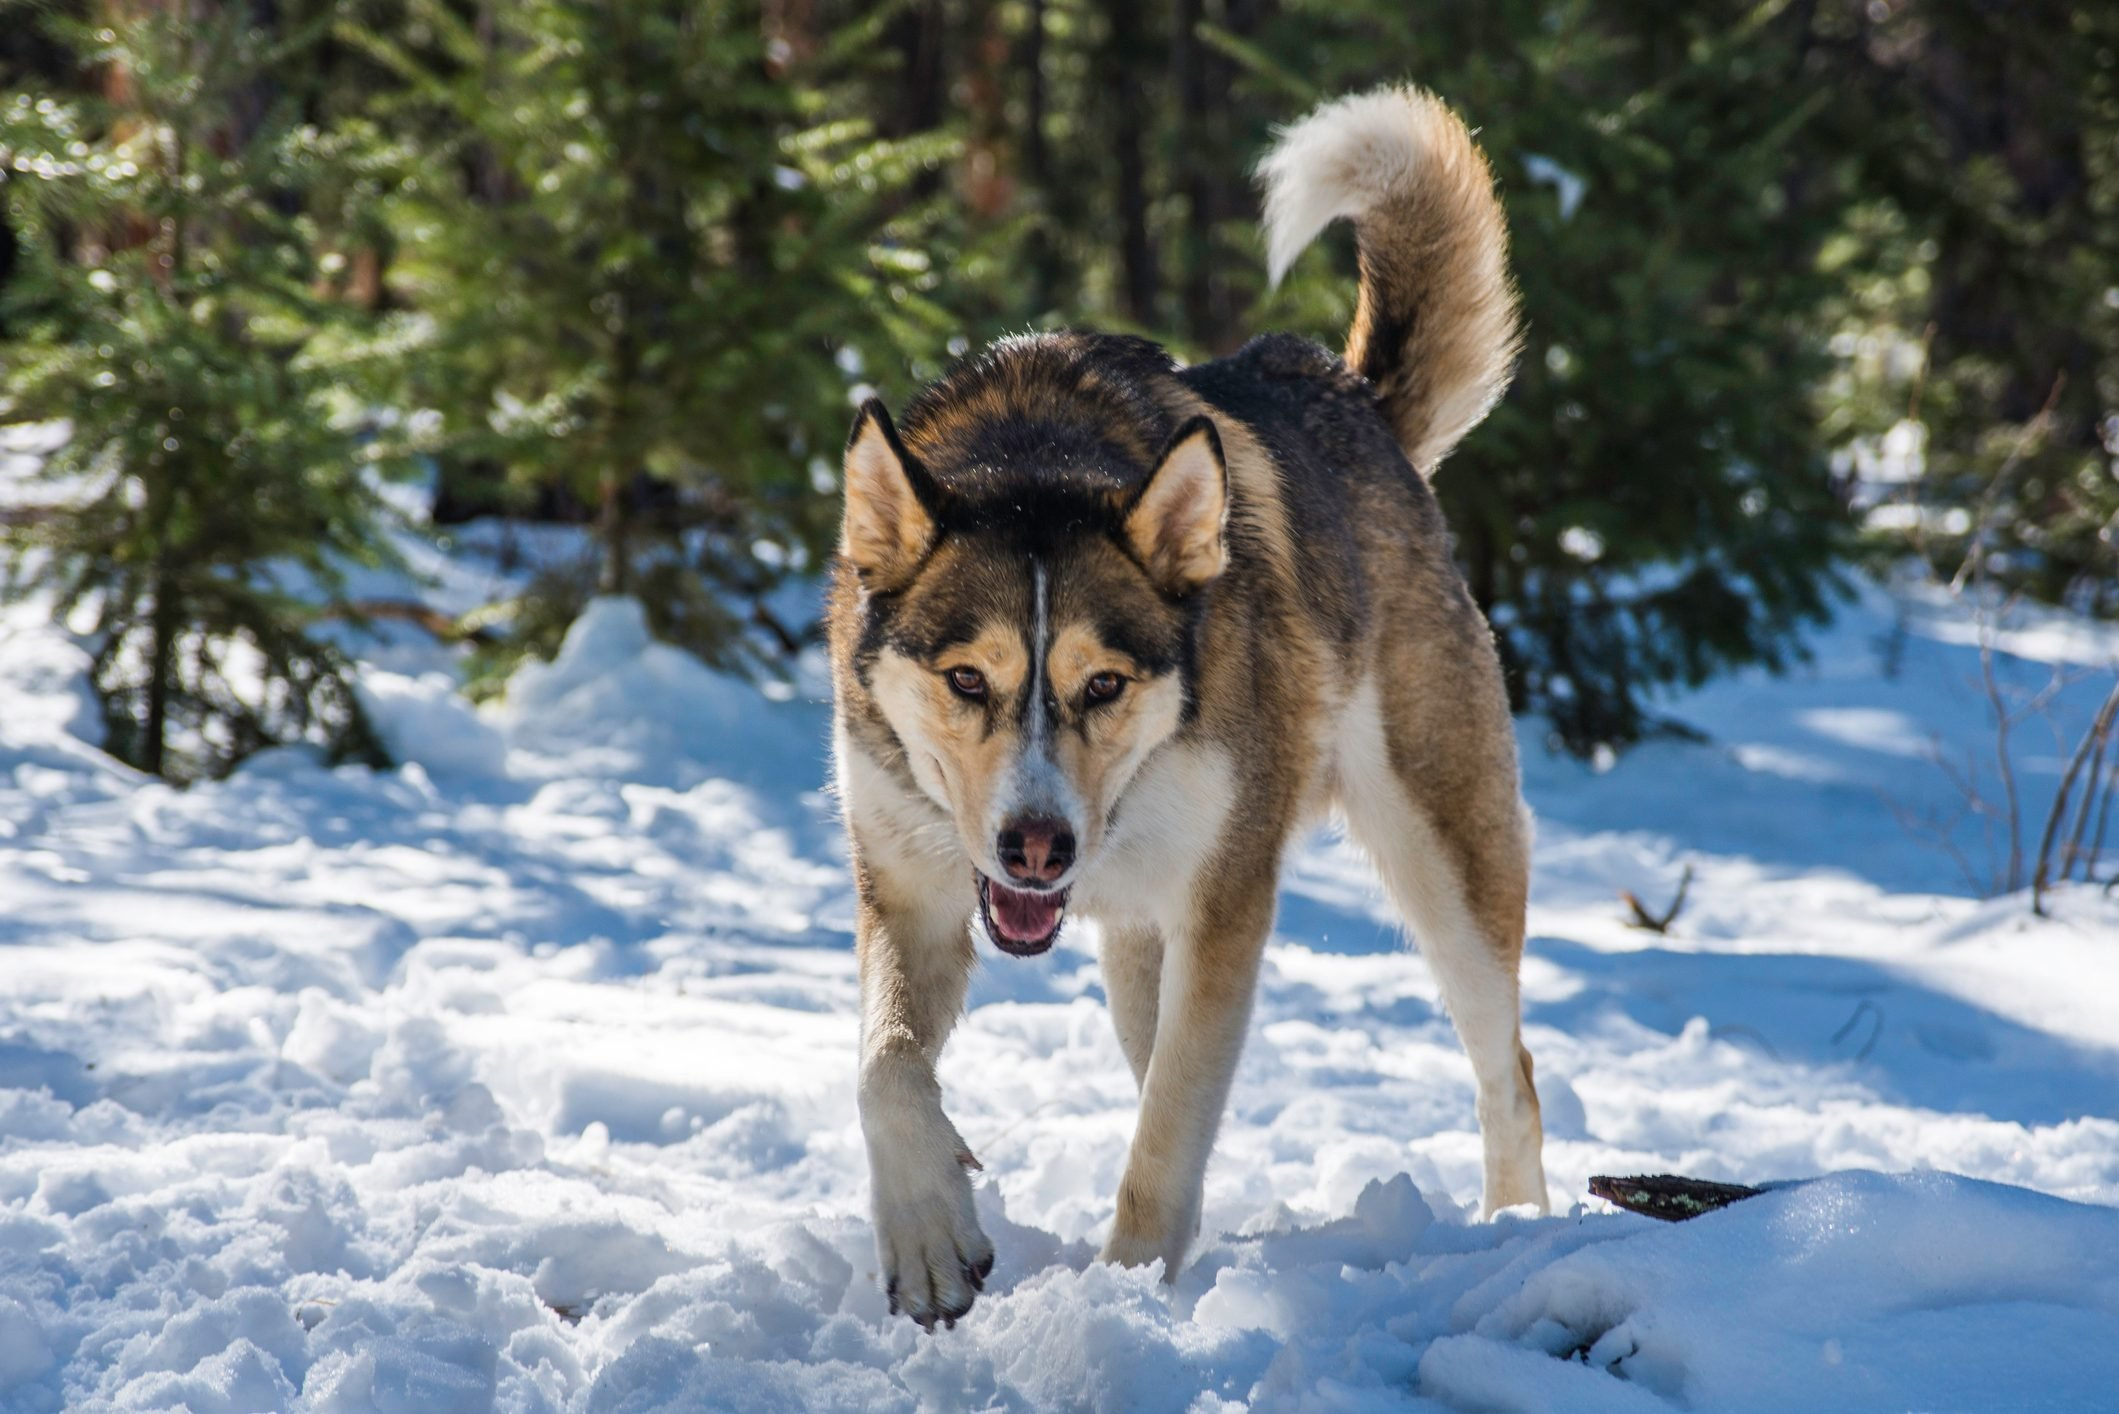 Husky dog walking on snow